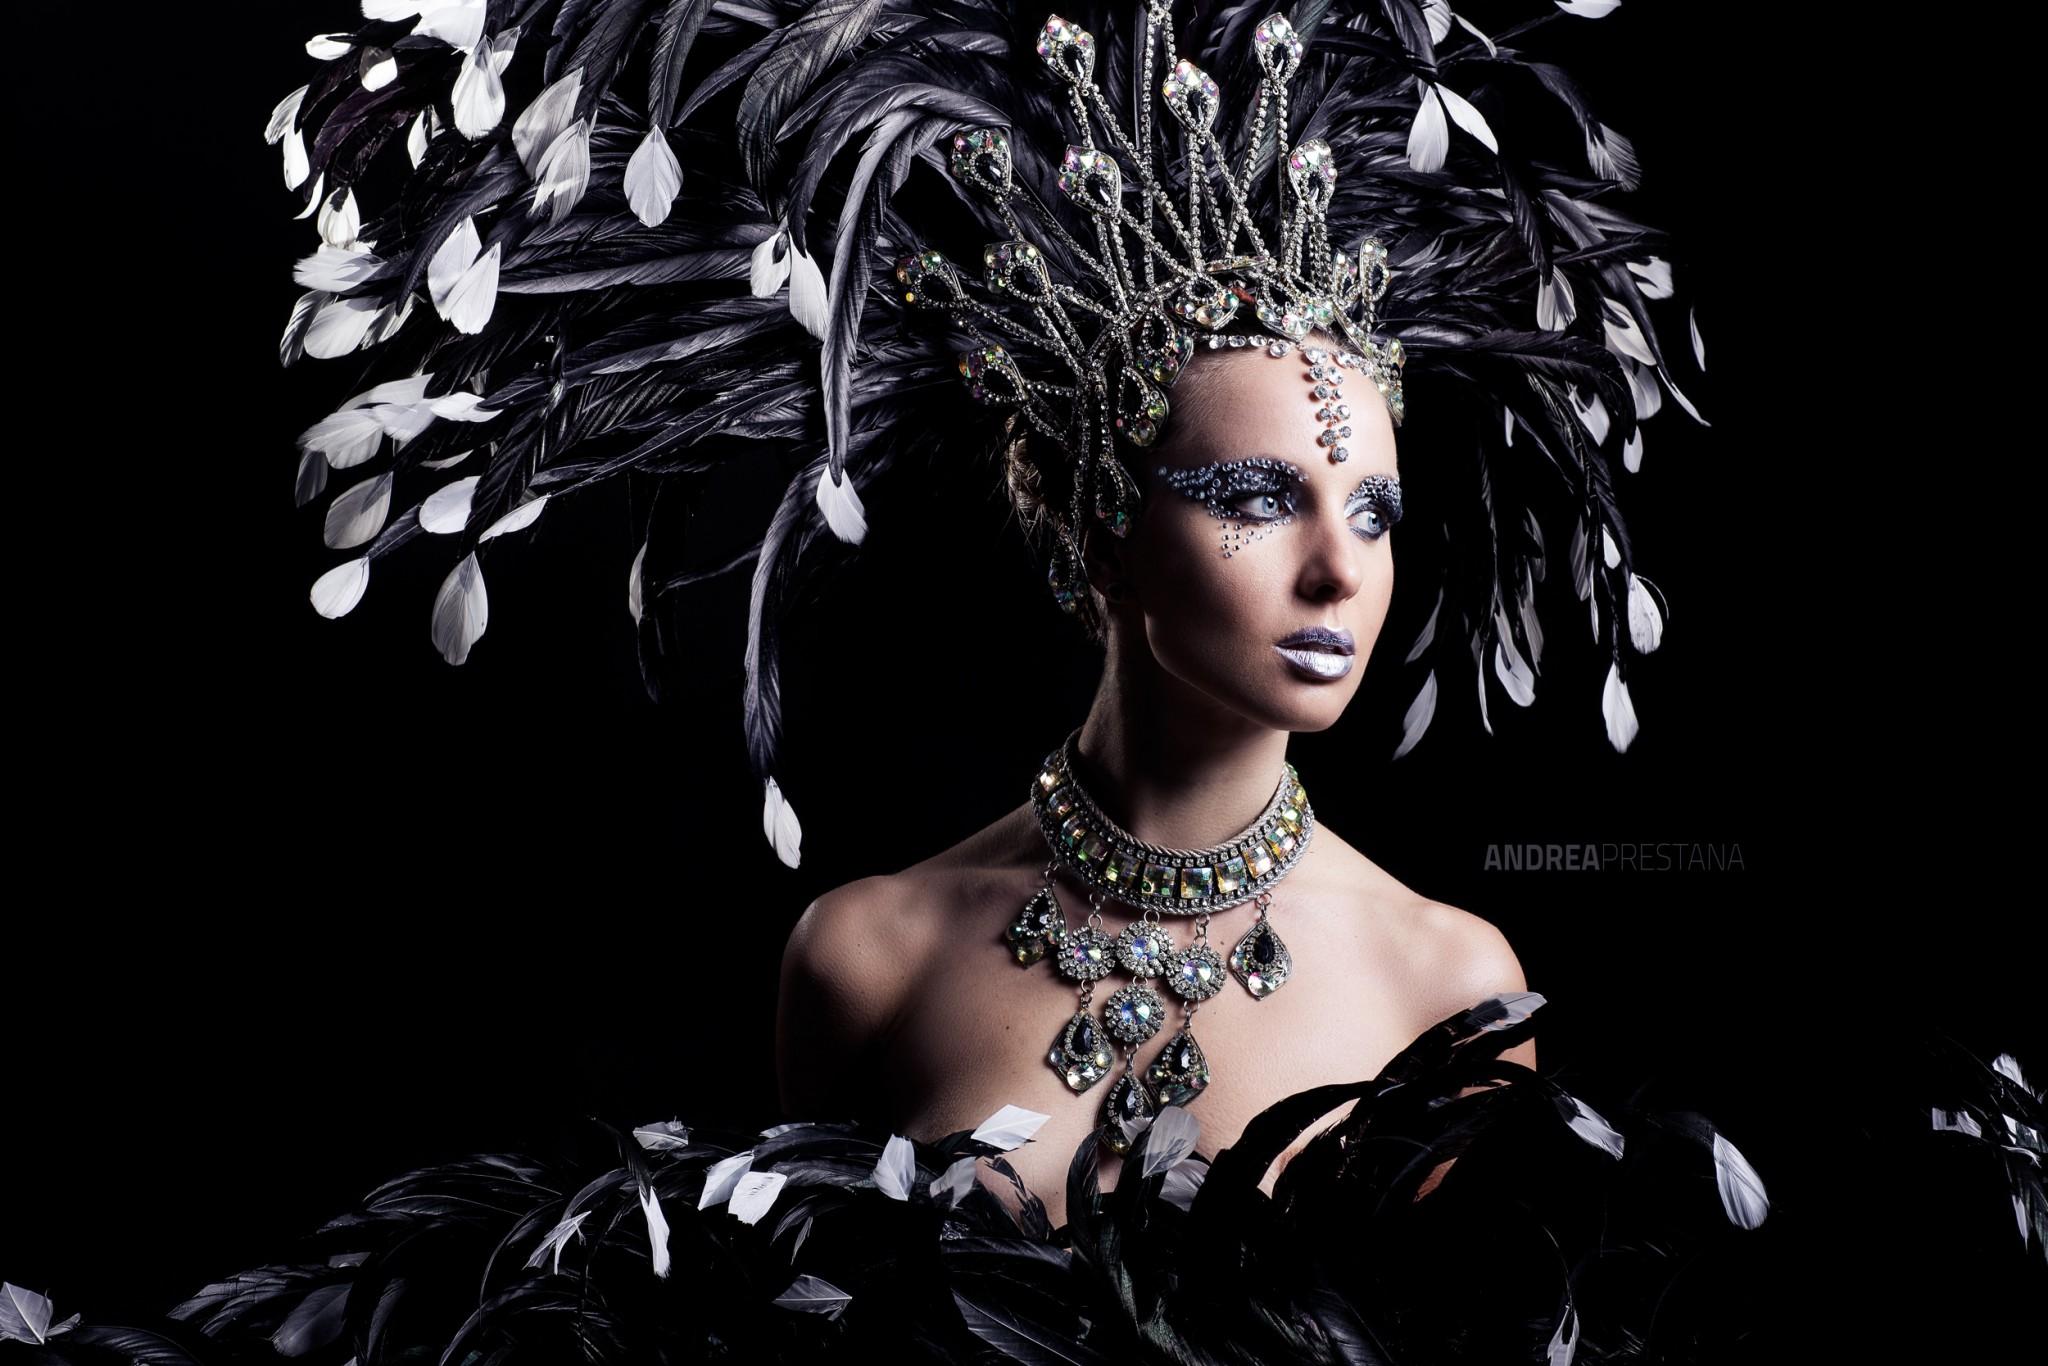 maschera carnevale brasiliano venezia di andrea prestana